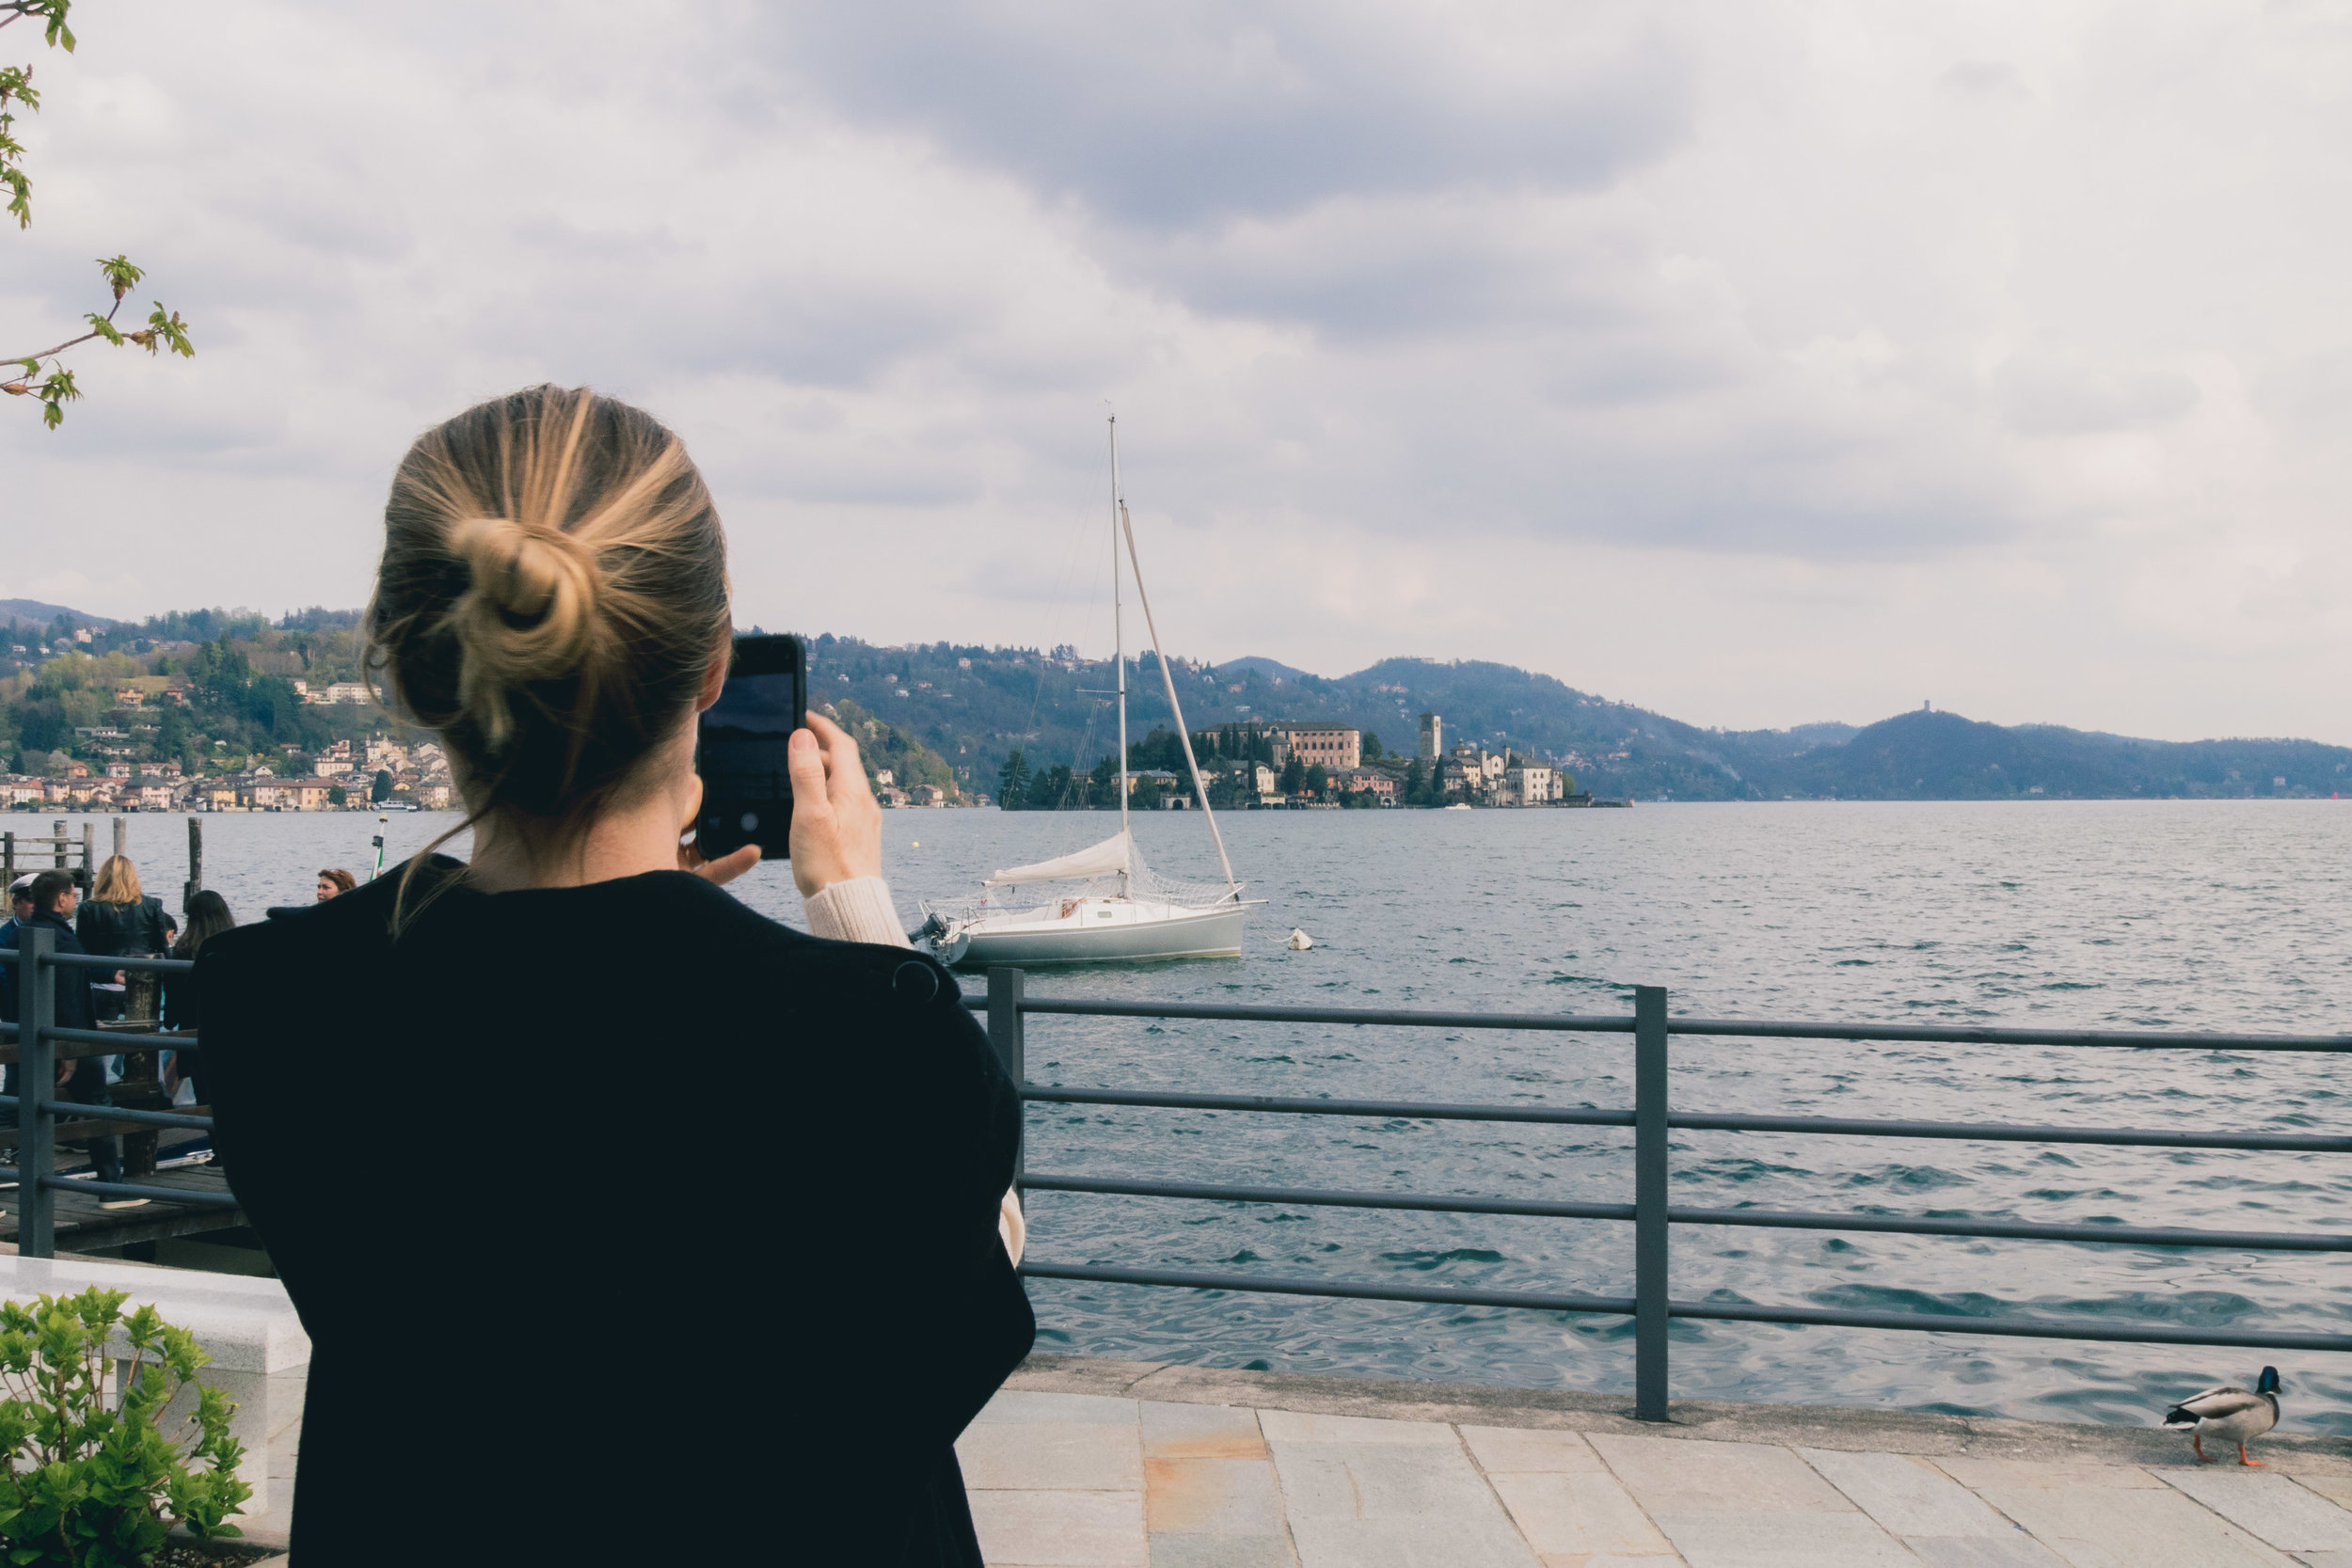 Lake_Orta_Fantini_day1-40.jpg